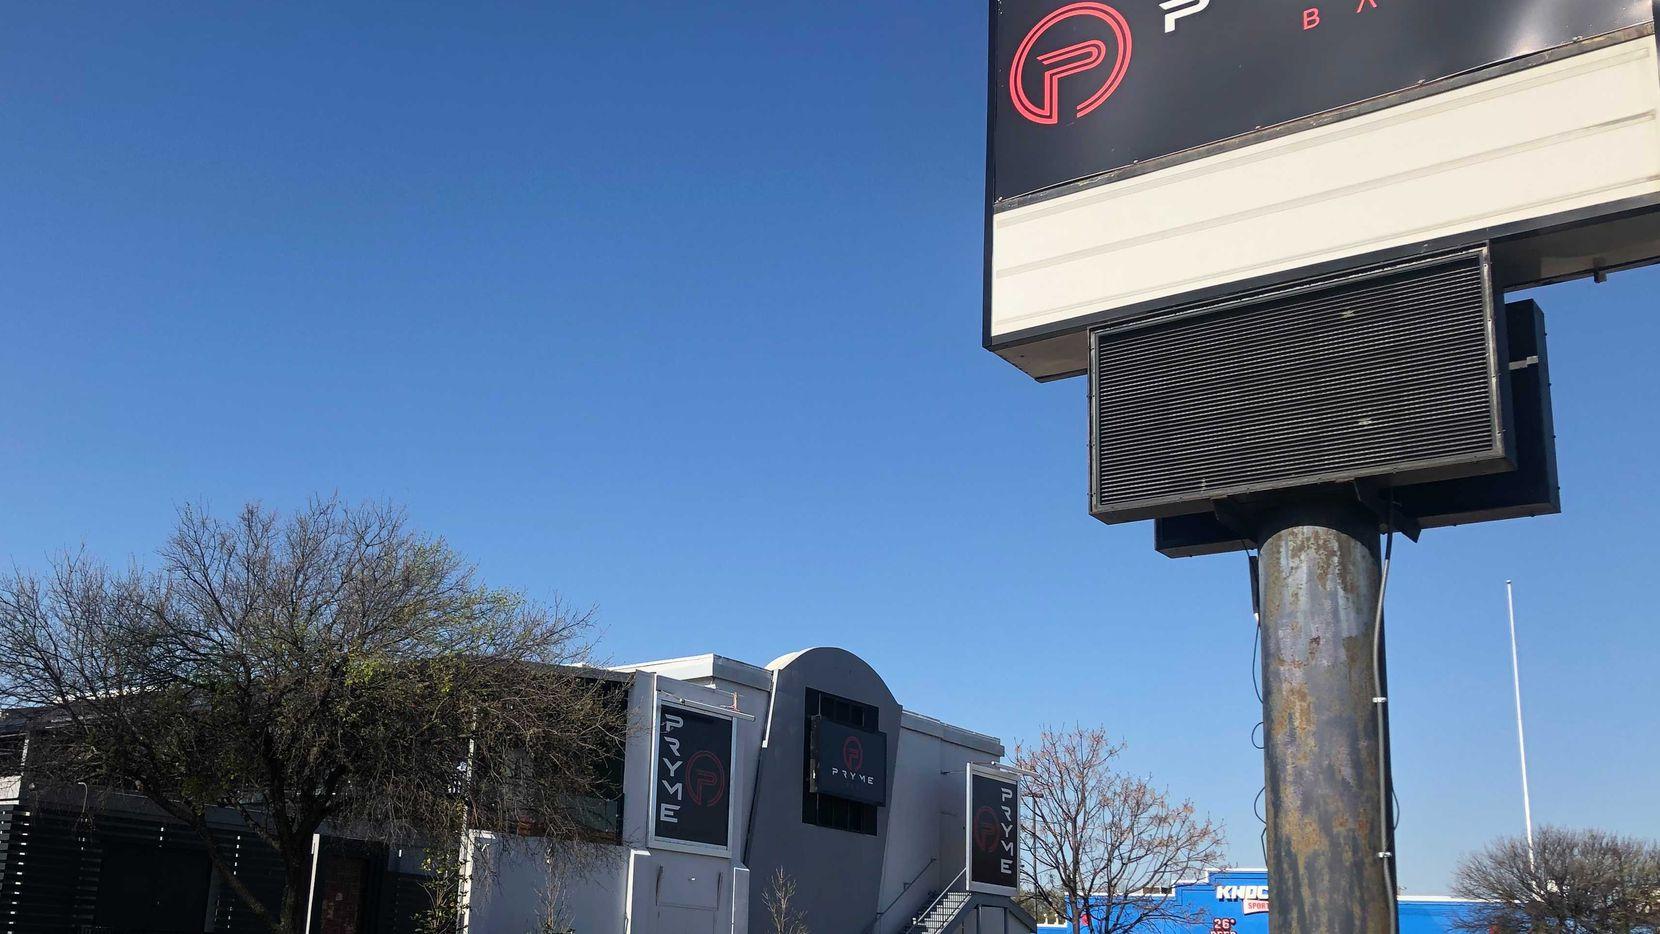 The shooting at Pryme Bar killed 21-year Daisy Navarrete of Plano.